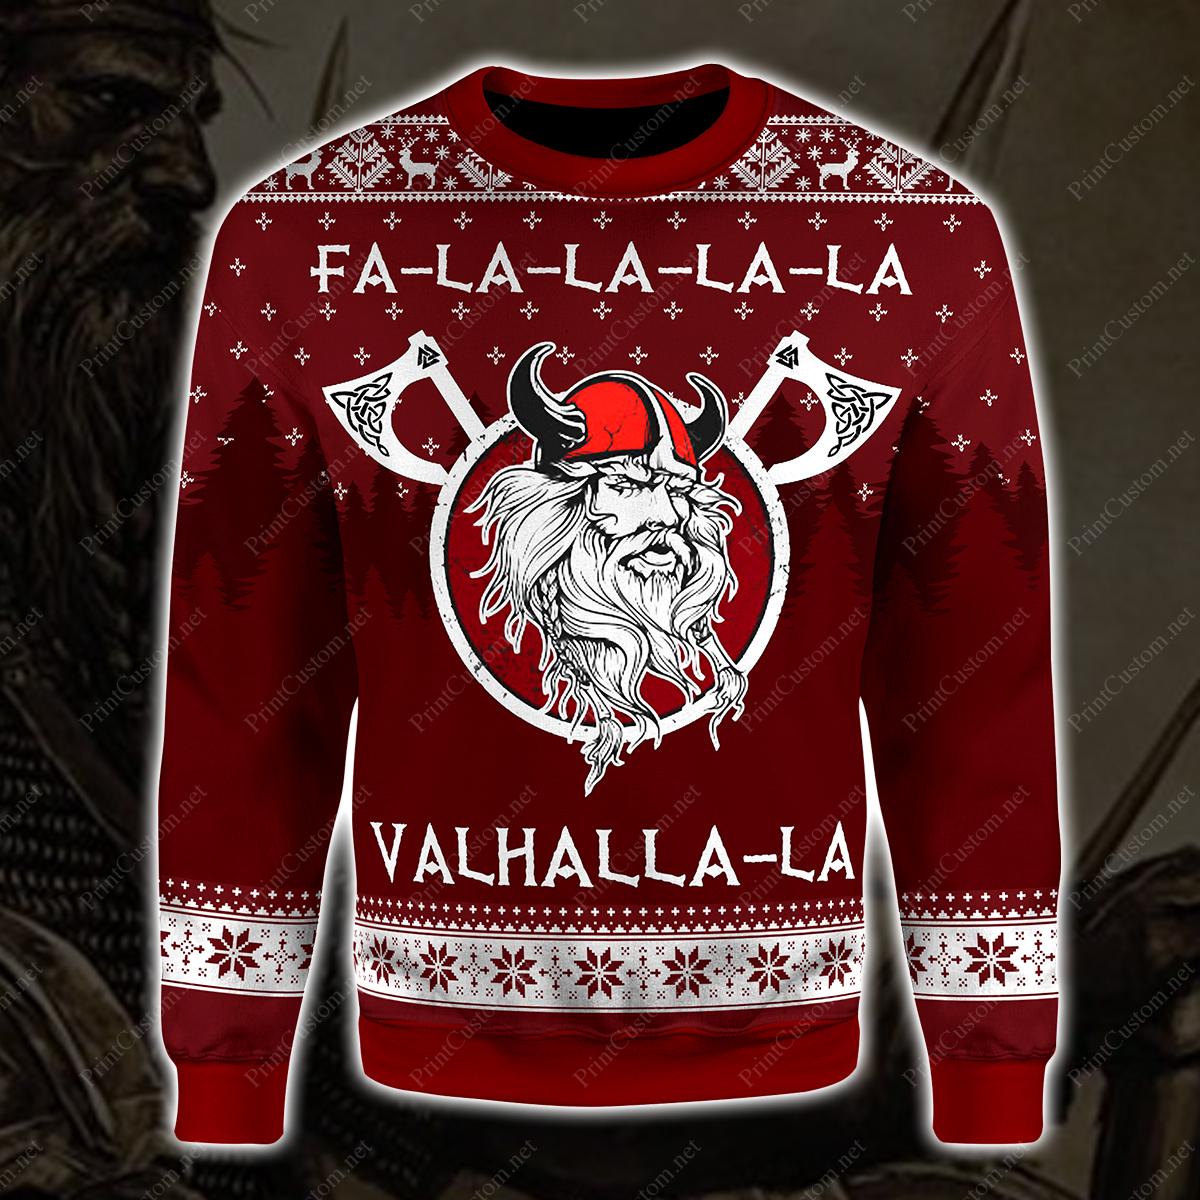 Fa-la-la-la-la valhalla-la viking ugly christmas sweater 3